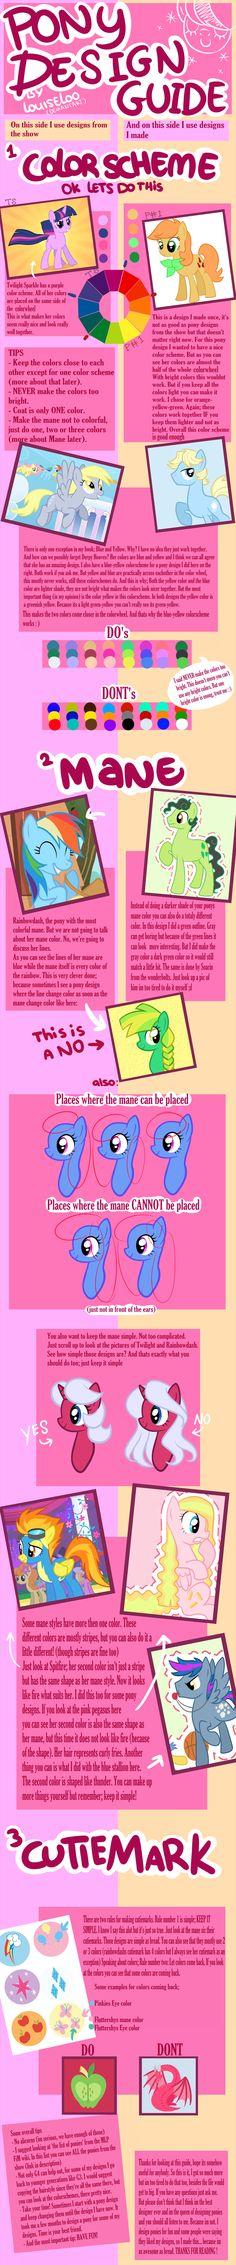 Pony Design Guide by Looji.deviantart.com on @DeviantArt